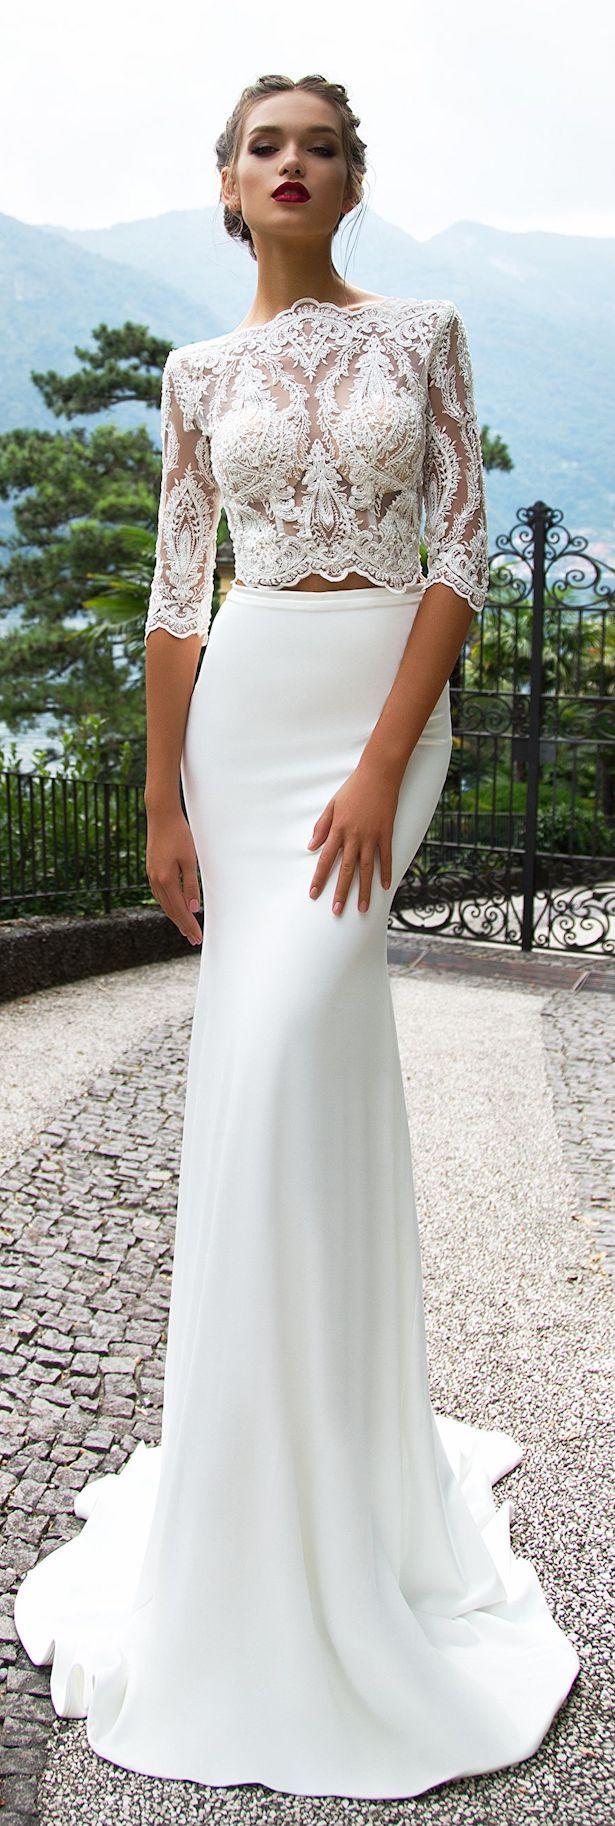 1380 best wedding newvintagedoll dresses images on pinterest wedding dress by milla nova white desire 2017 bridal collection merill junglespirit Image collections